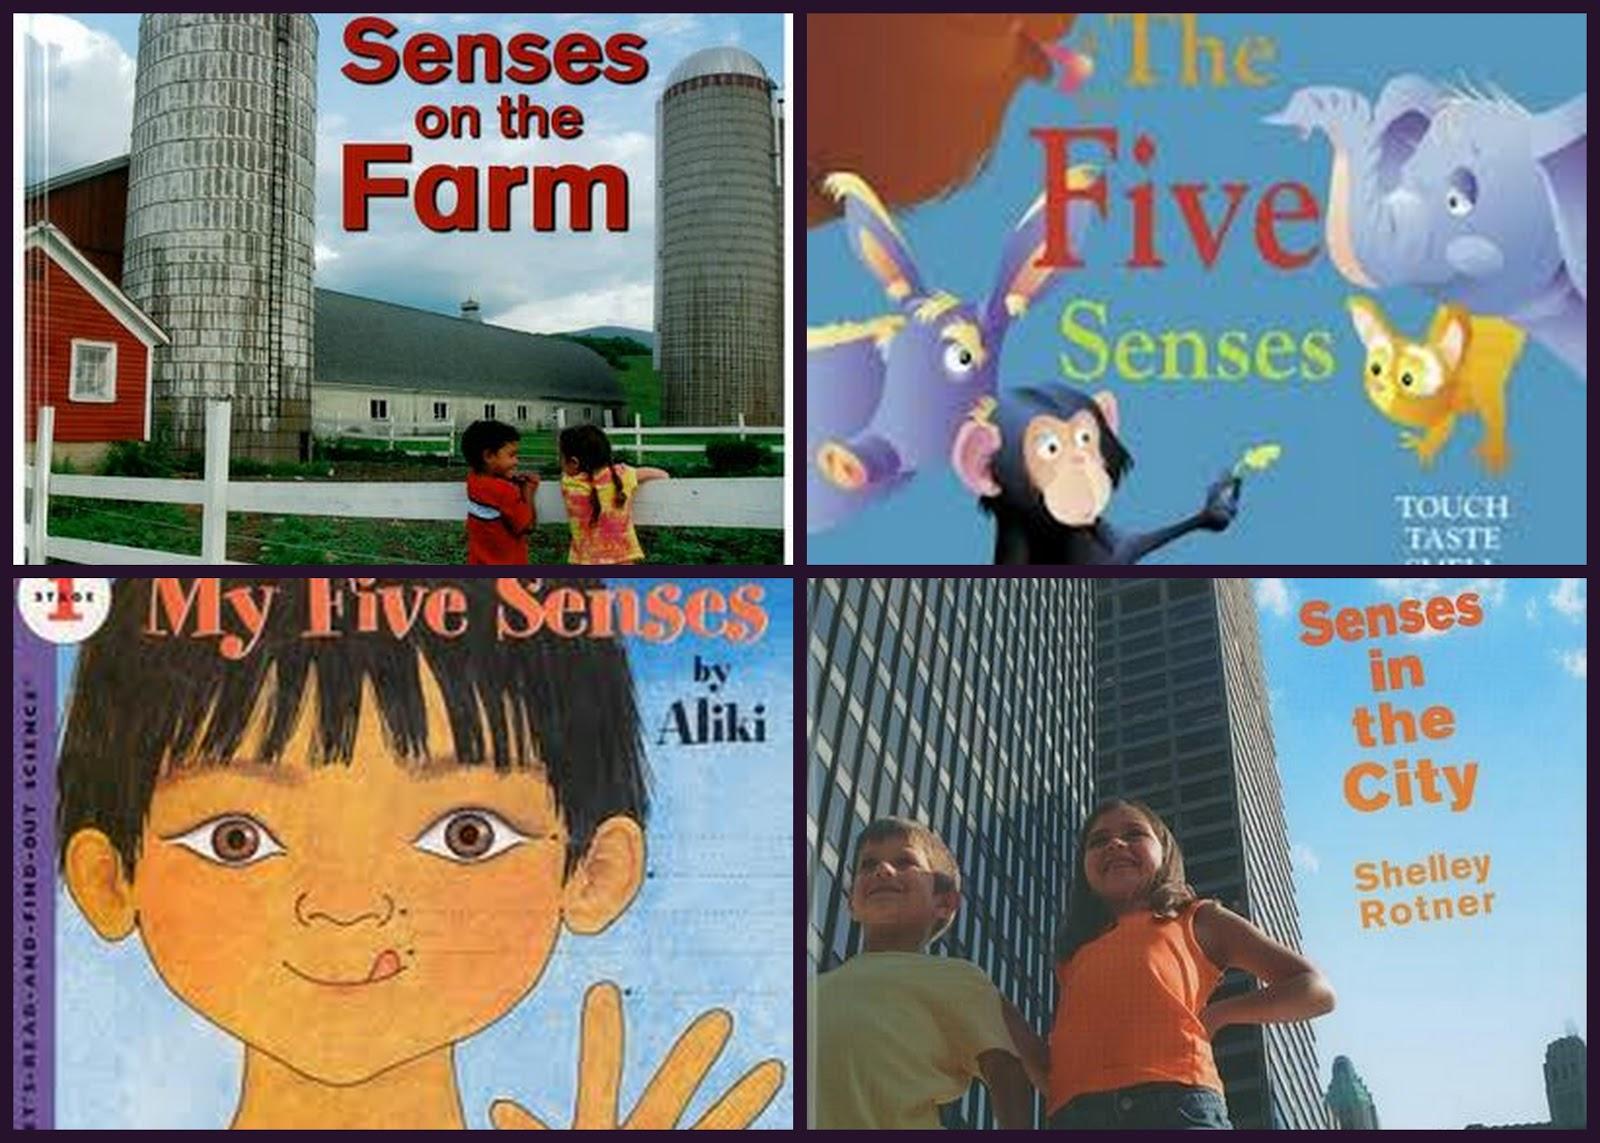 The Johnson Journey Unit Theme 5 Senses